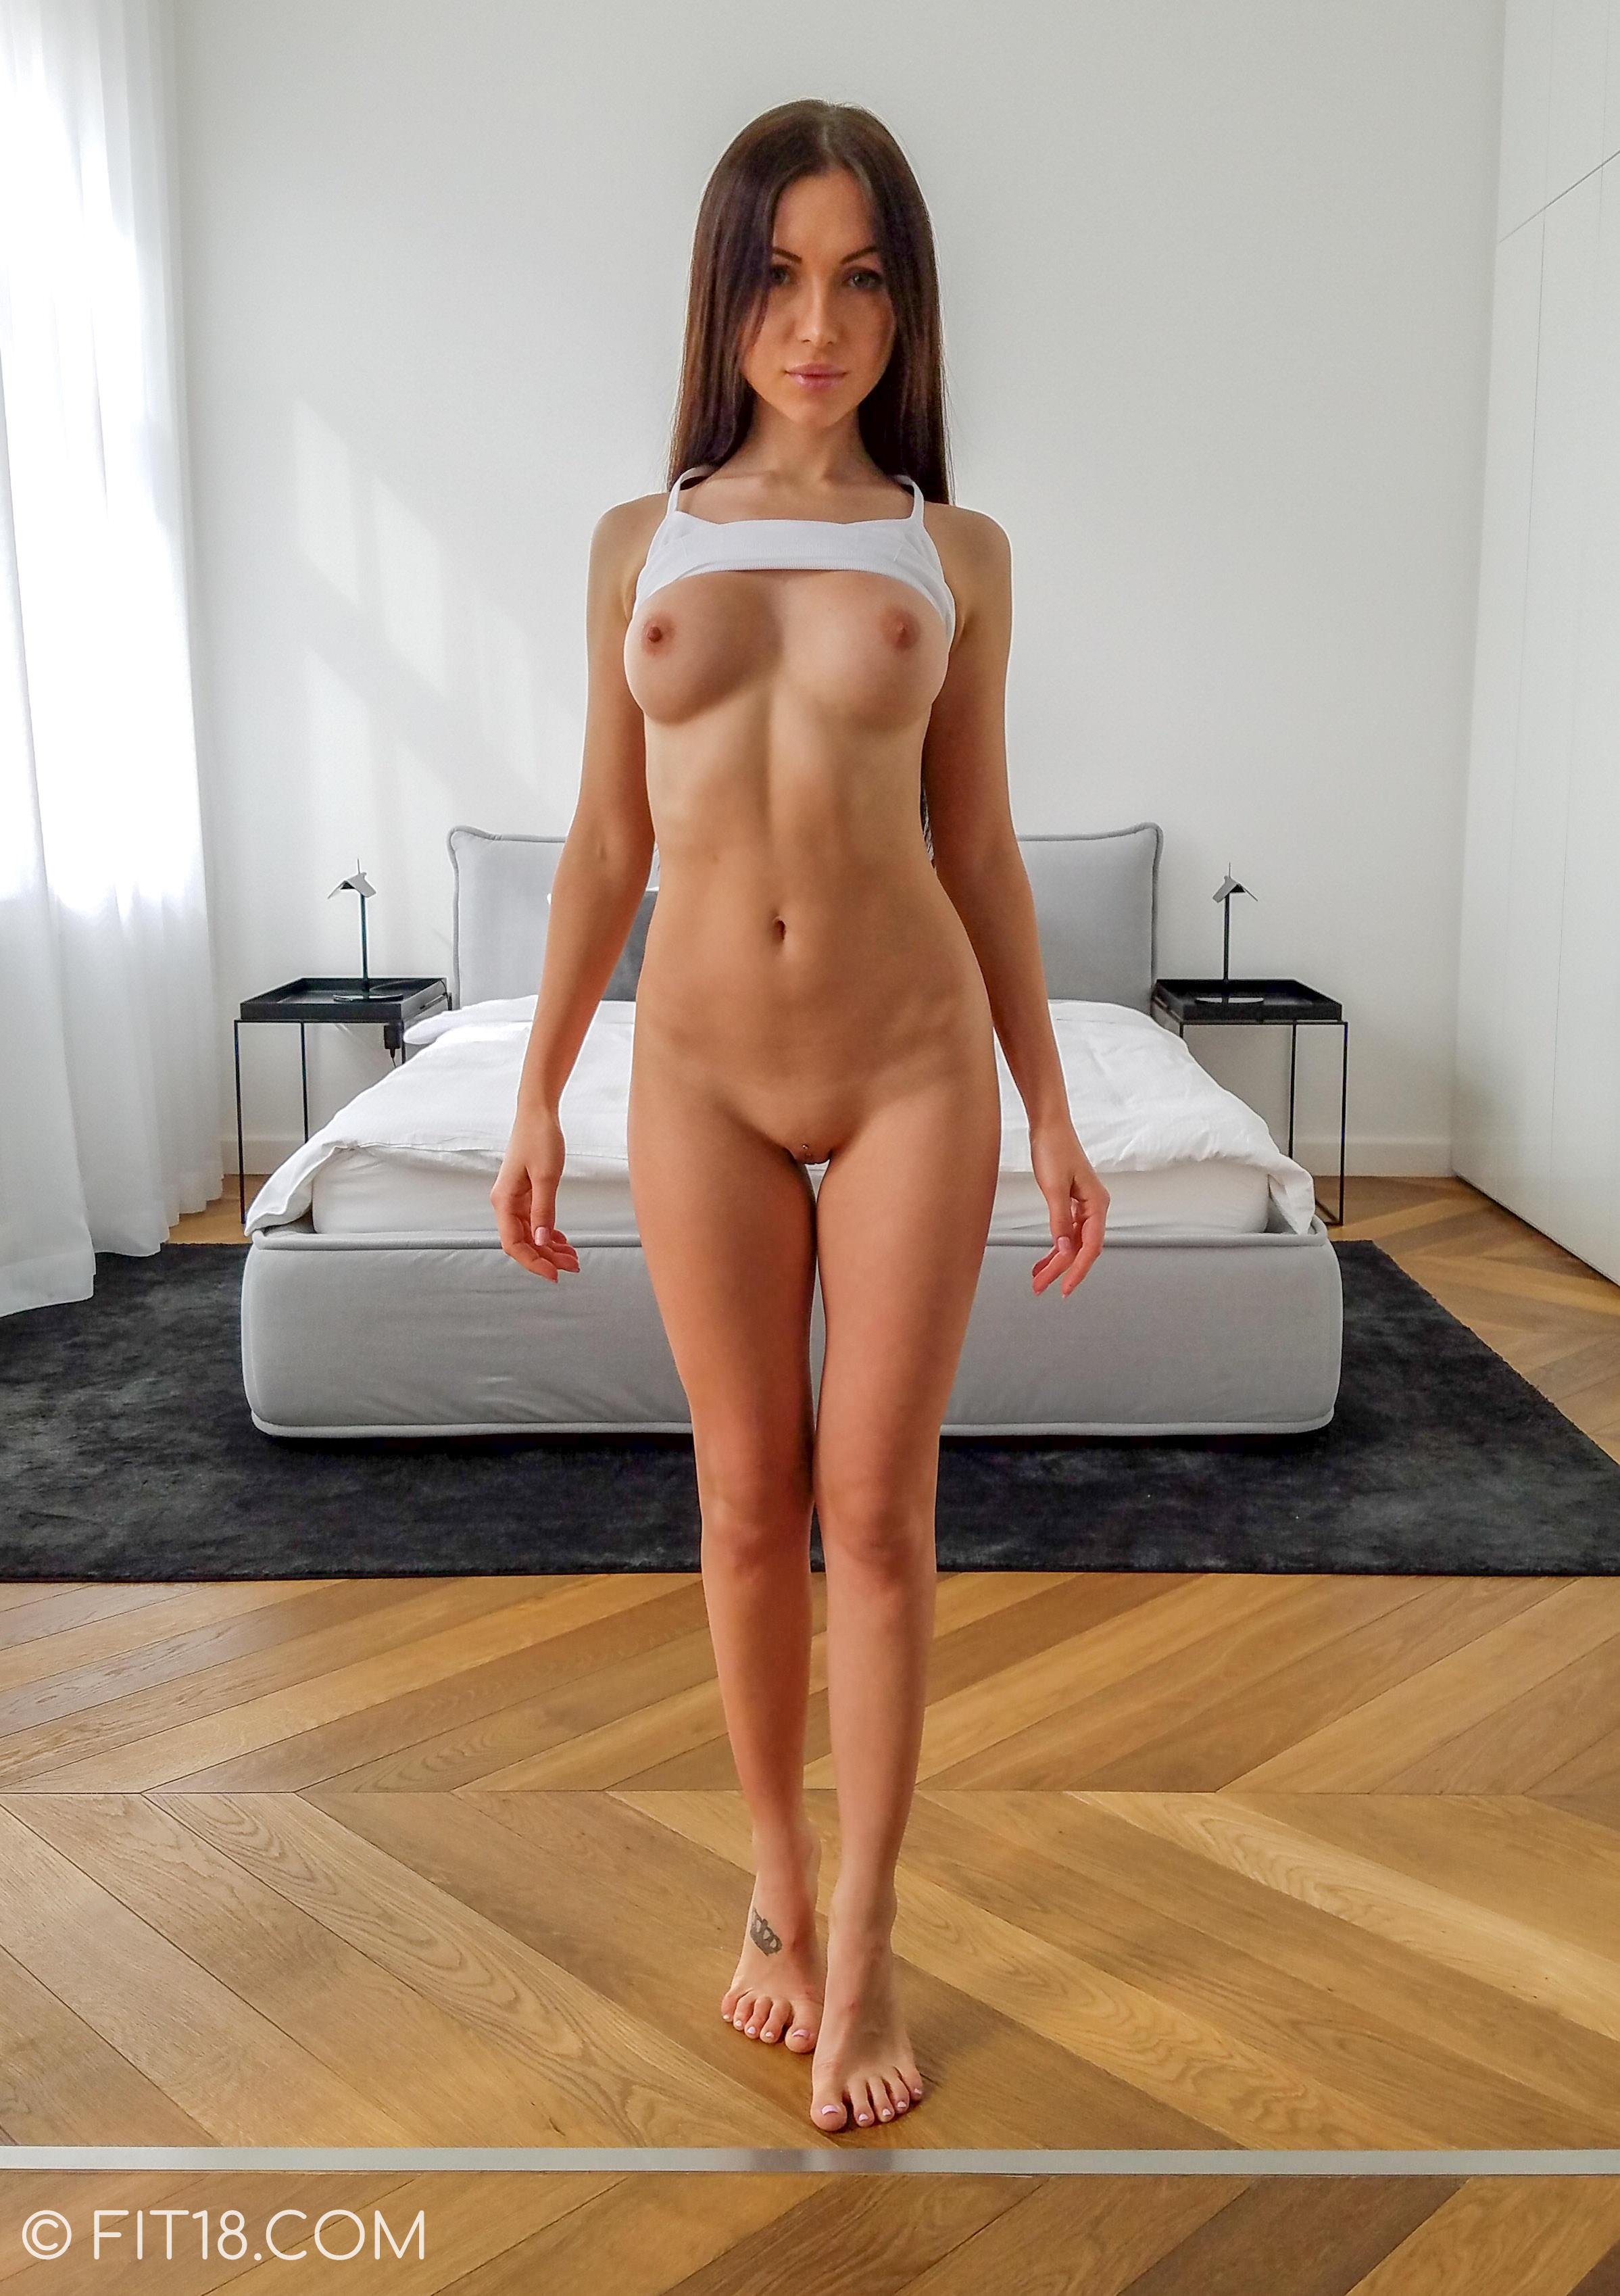 Sasha rose anal porno chaud serré ébène chatte